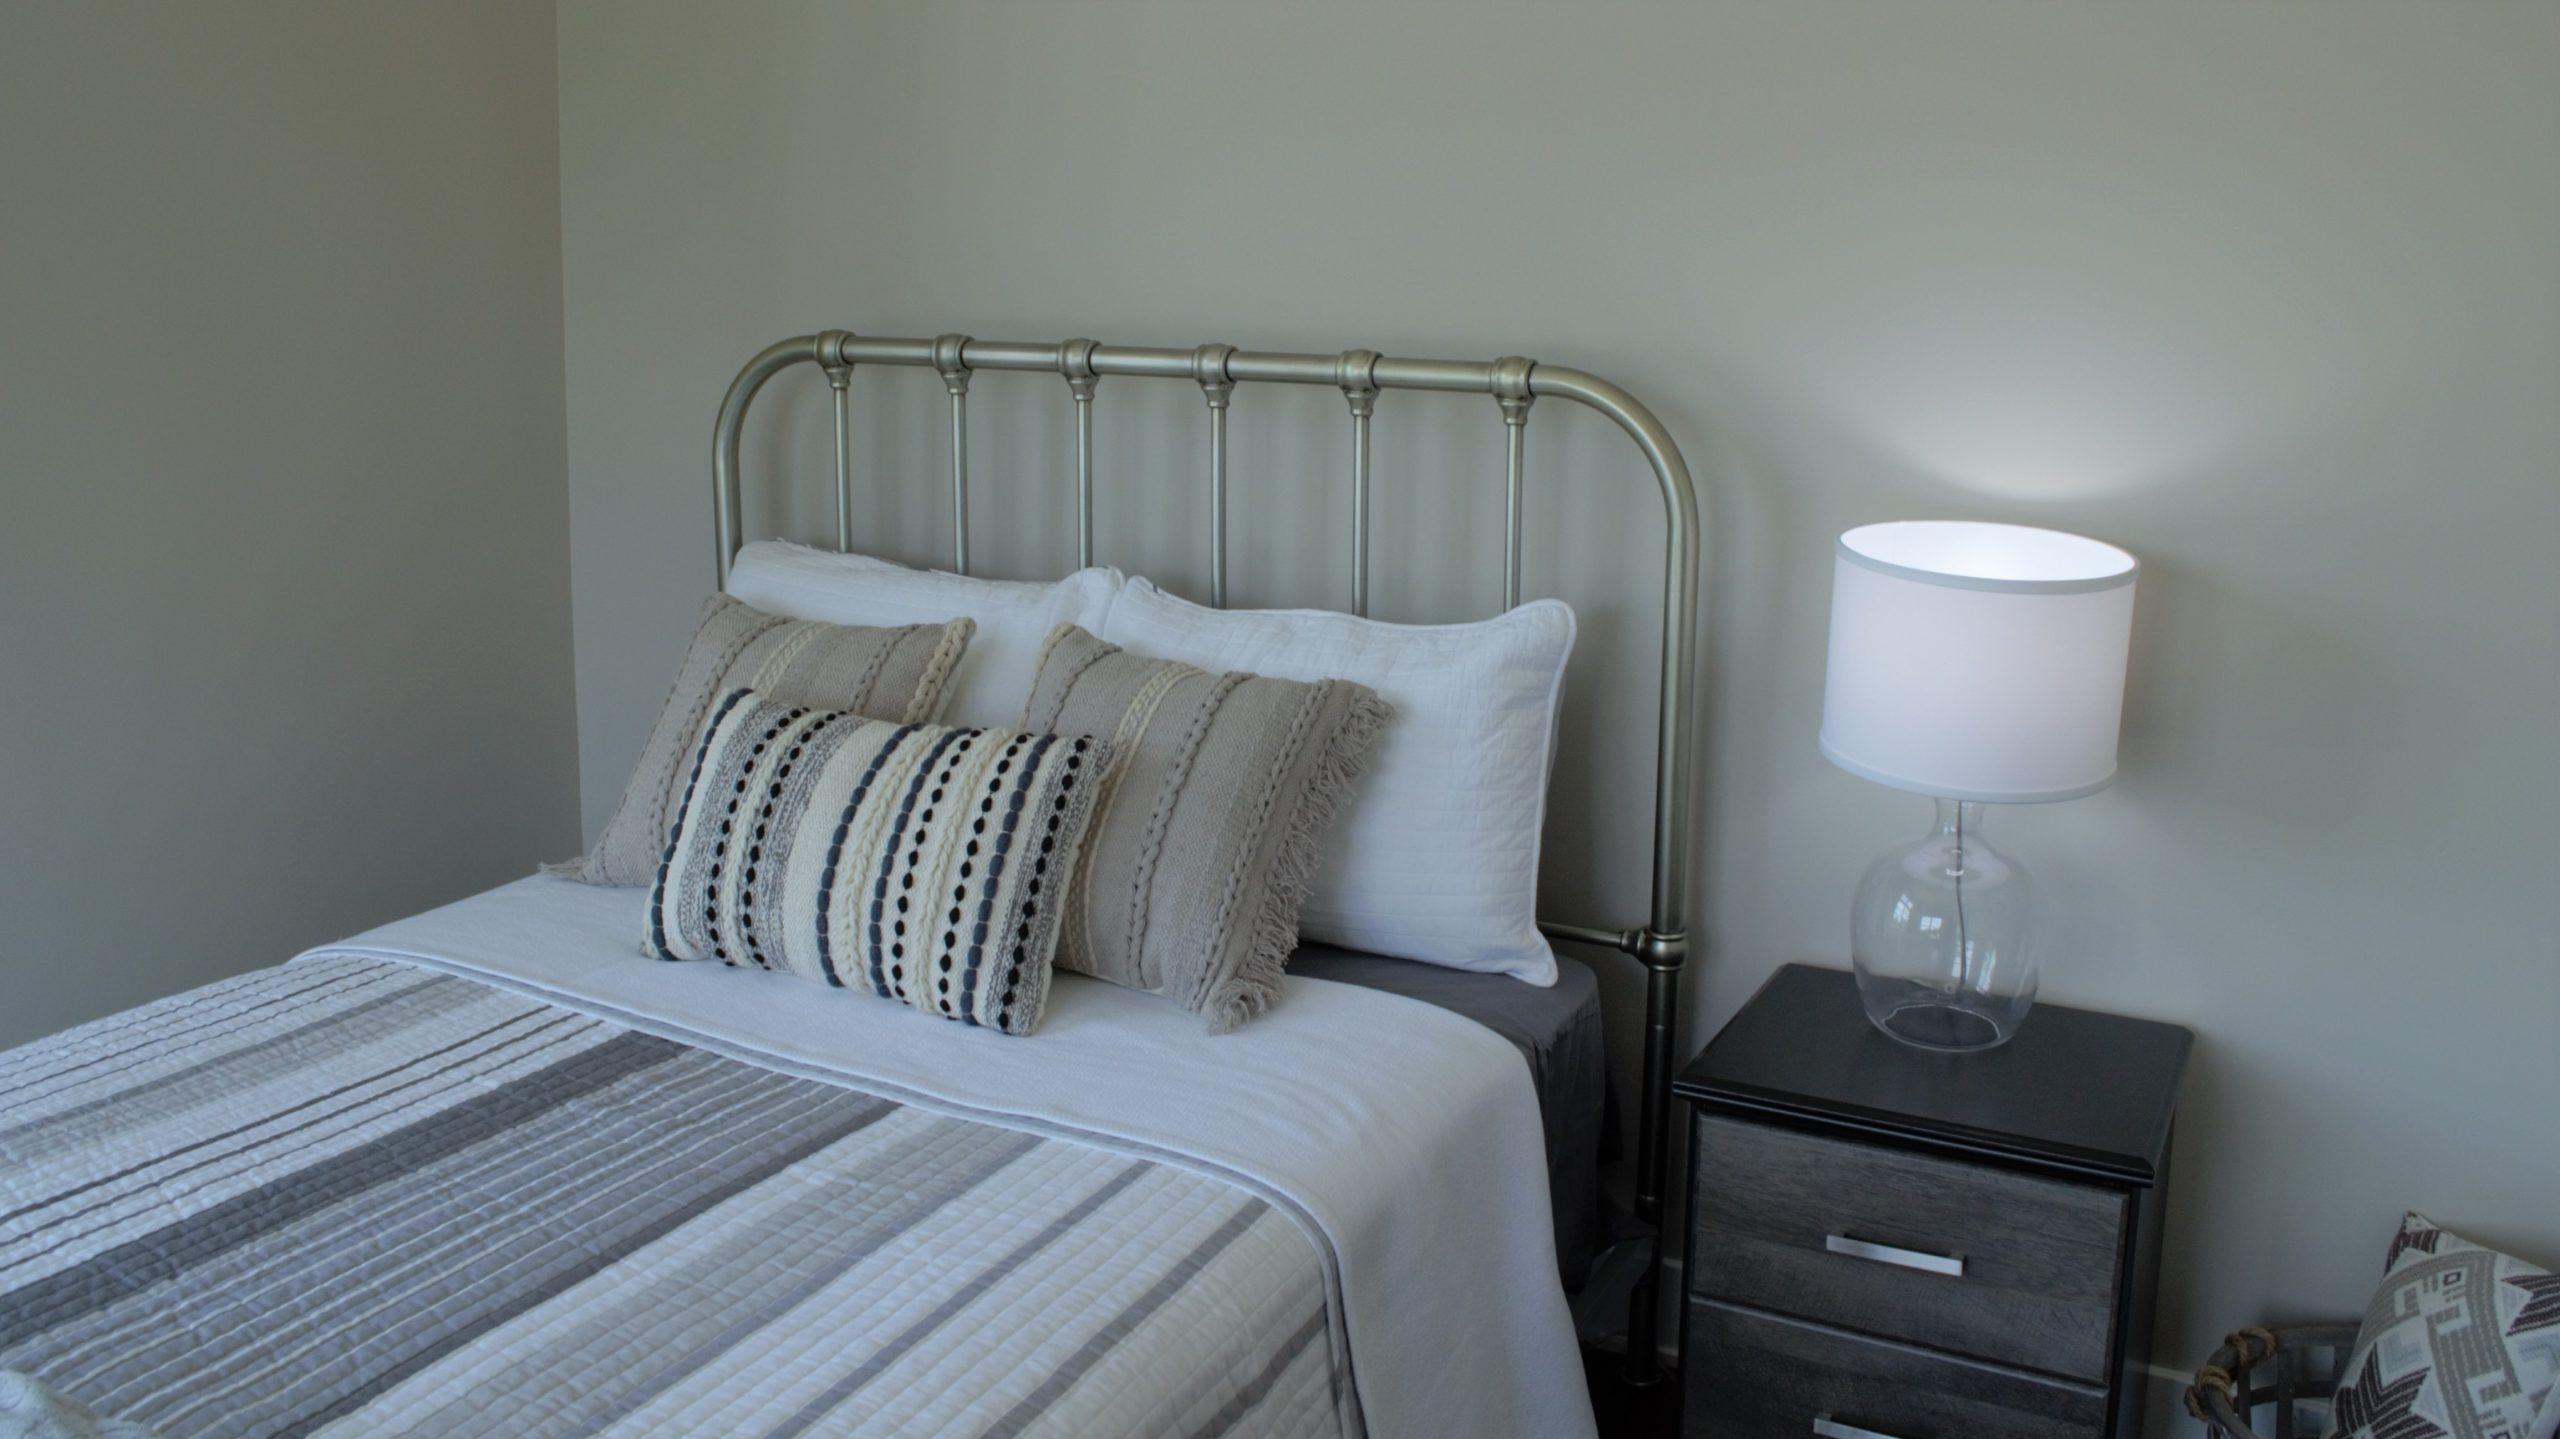 SPS TA Bldg 1 bed